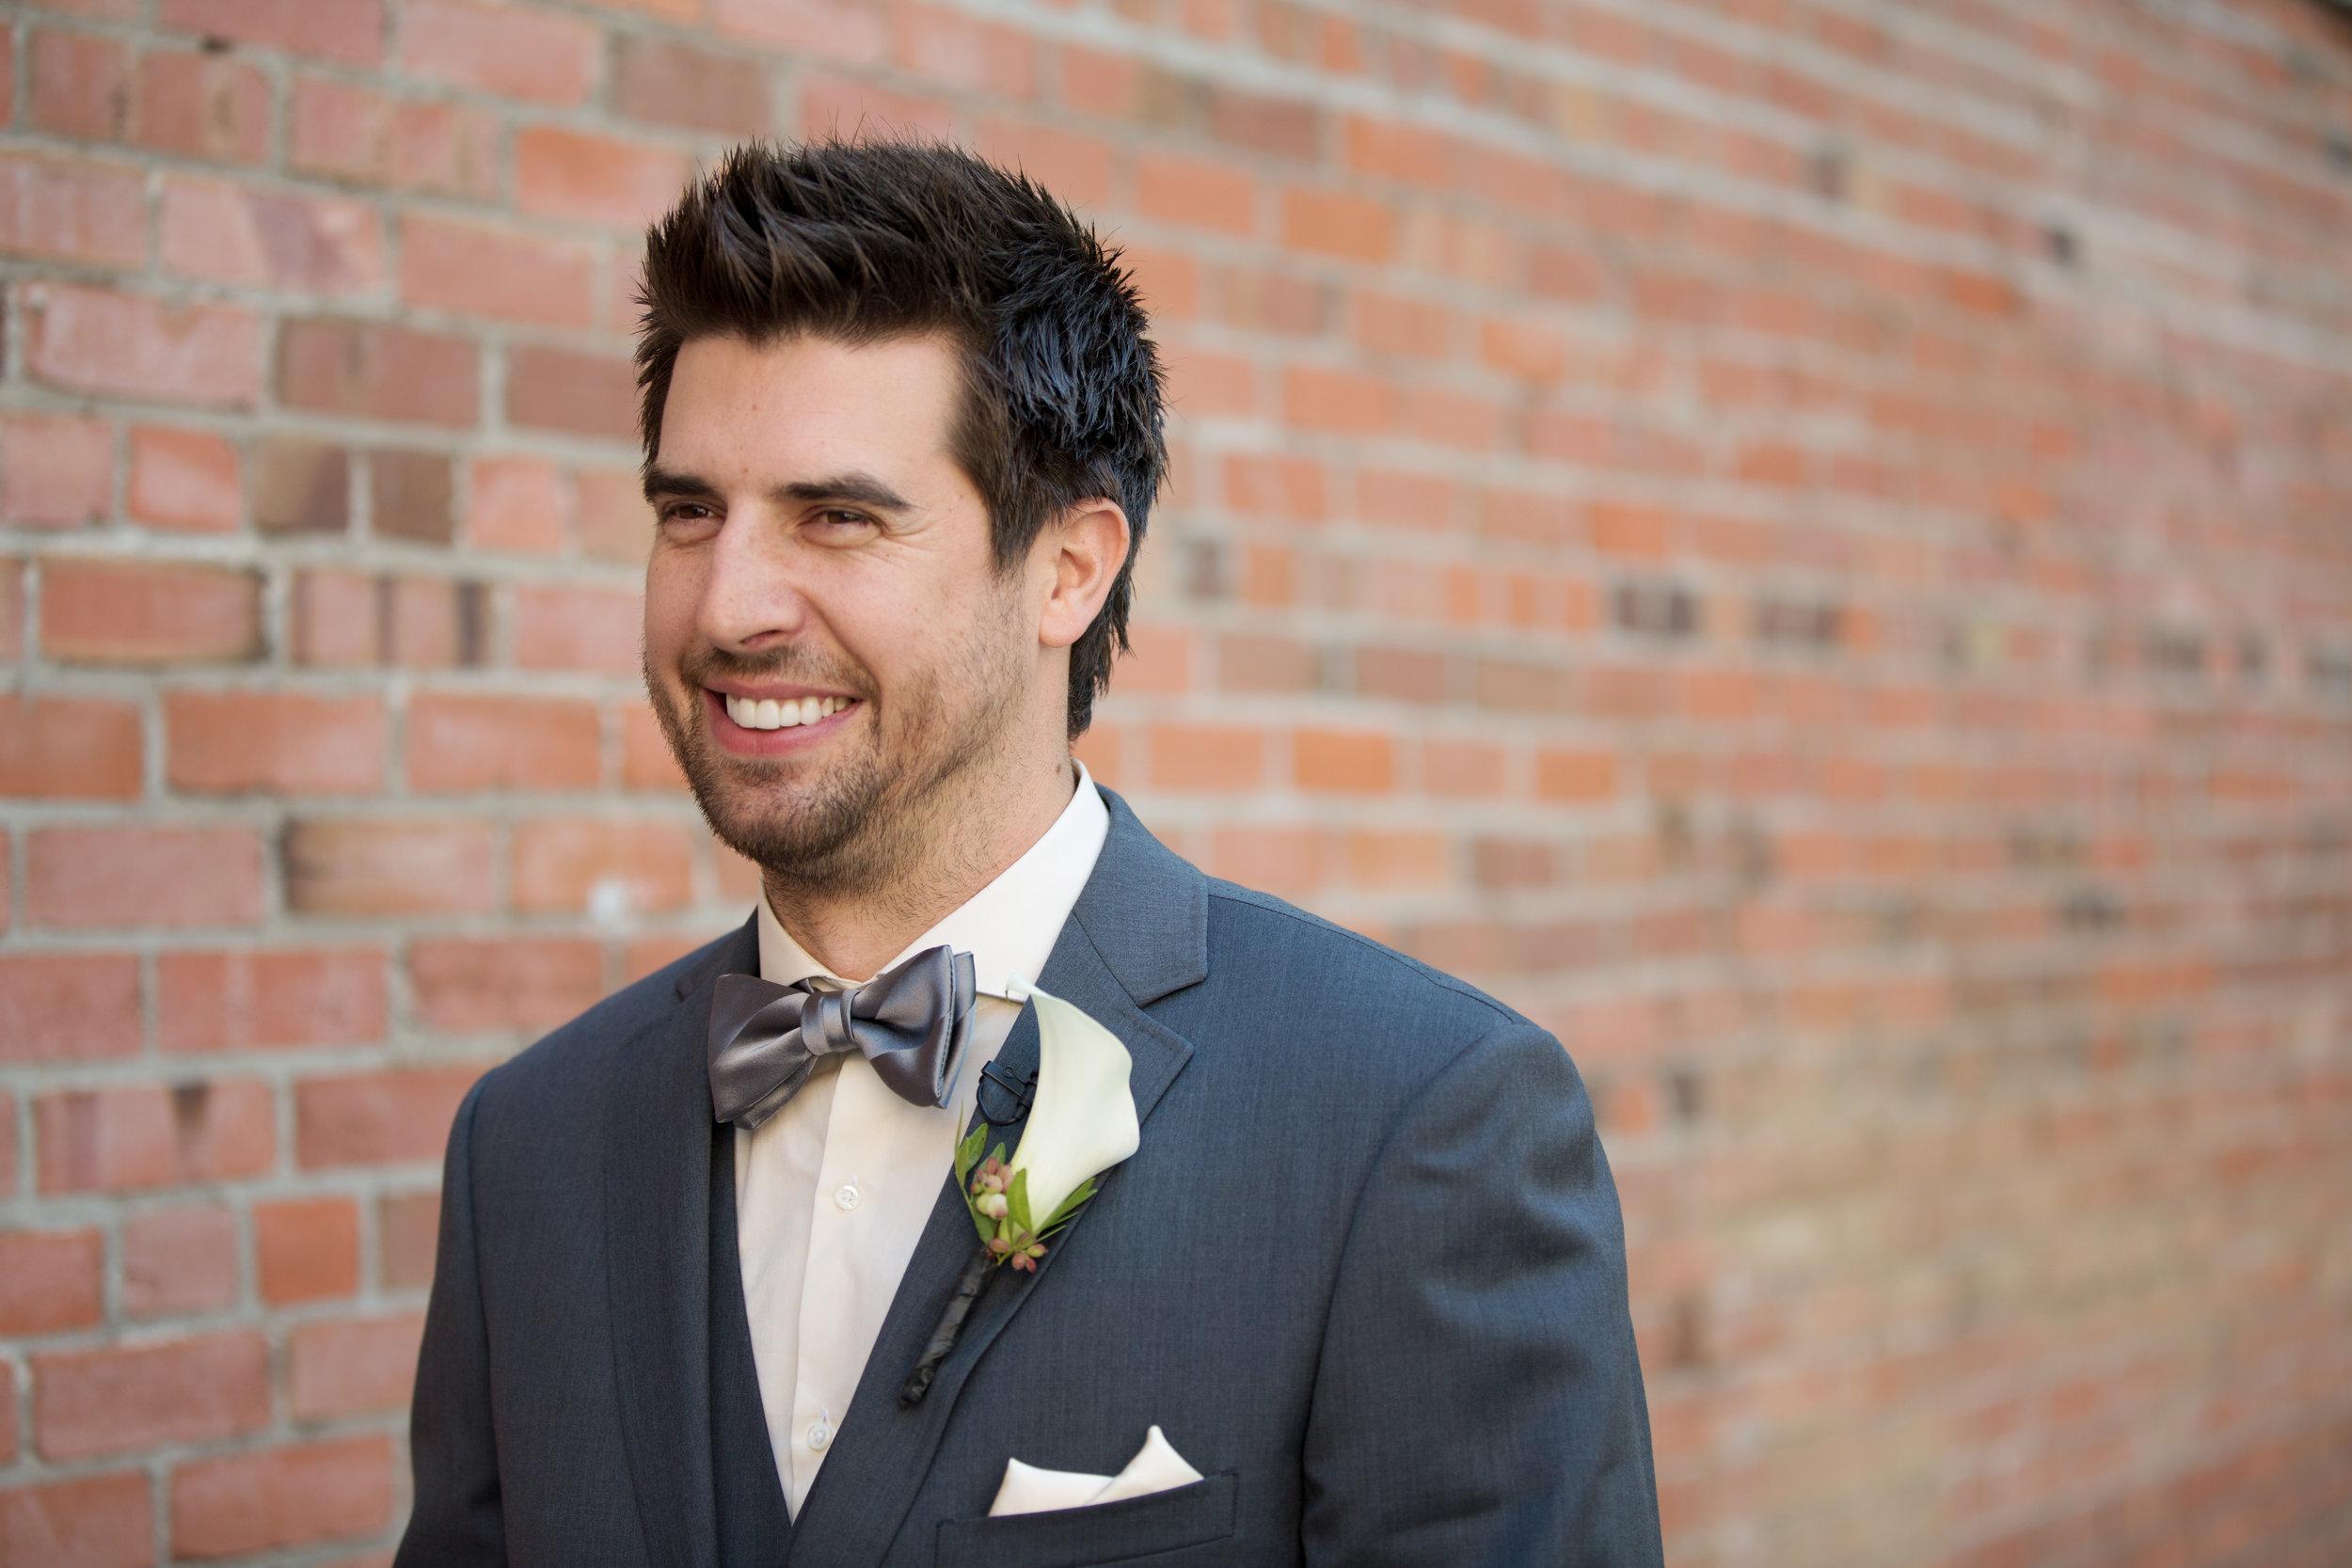 Calgary_Wedding_Photographer_Sanja_Scott_2016_HR 0181.jpg